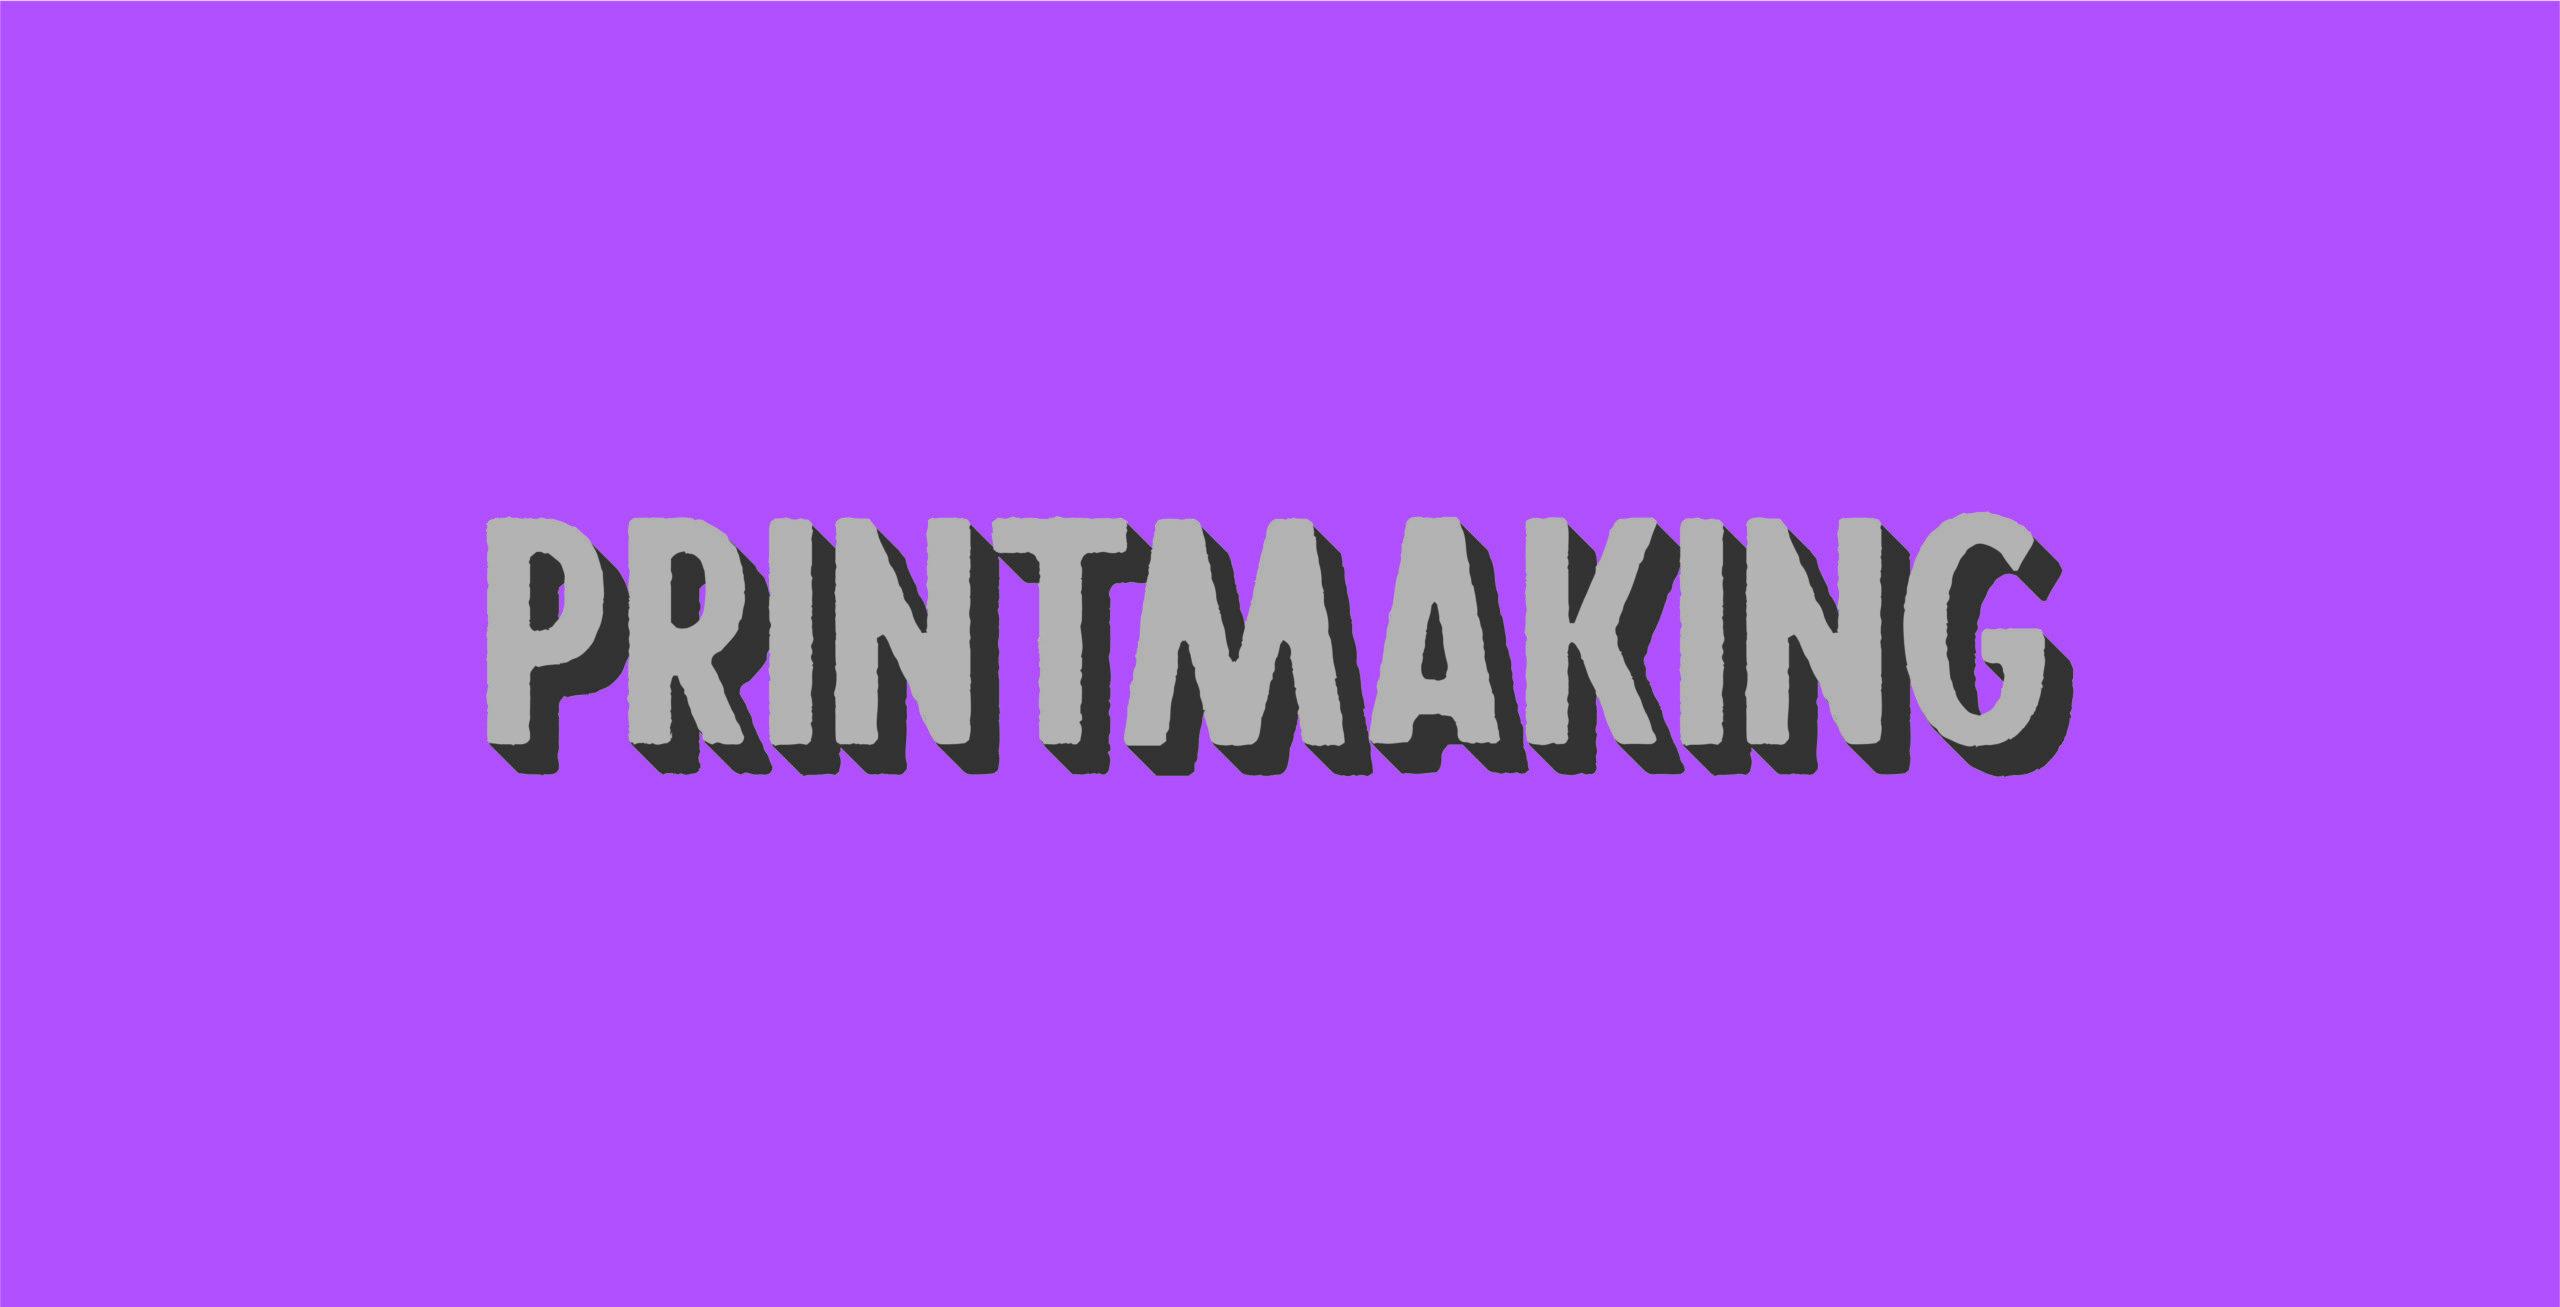 Learning Printmaking